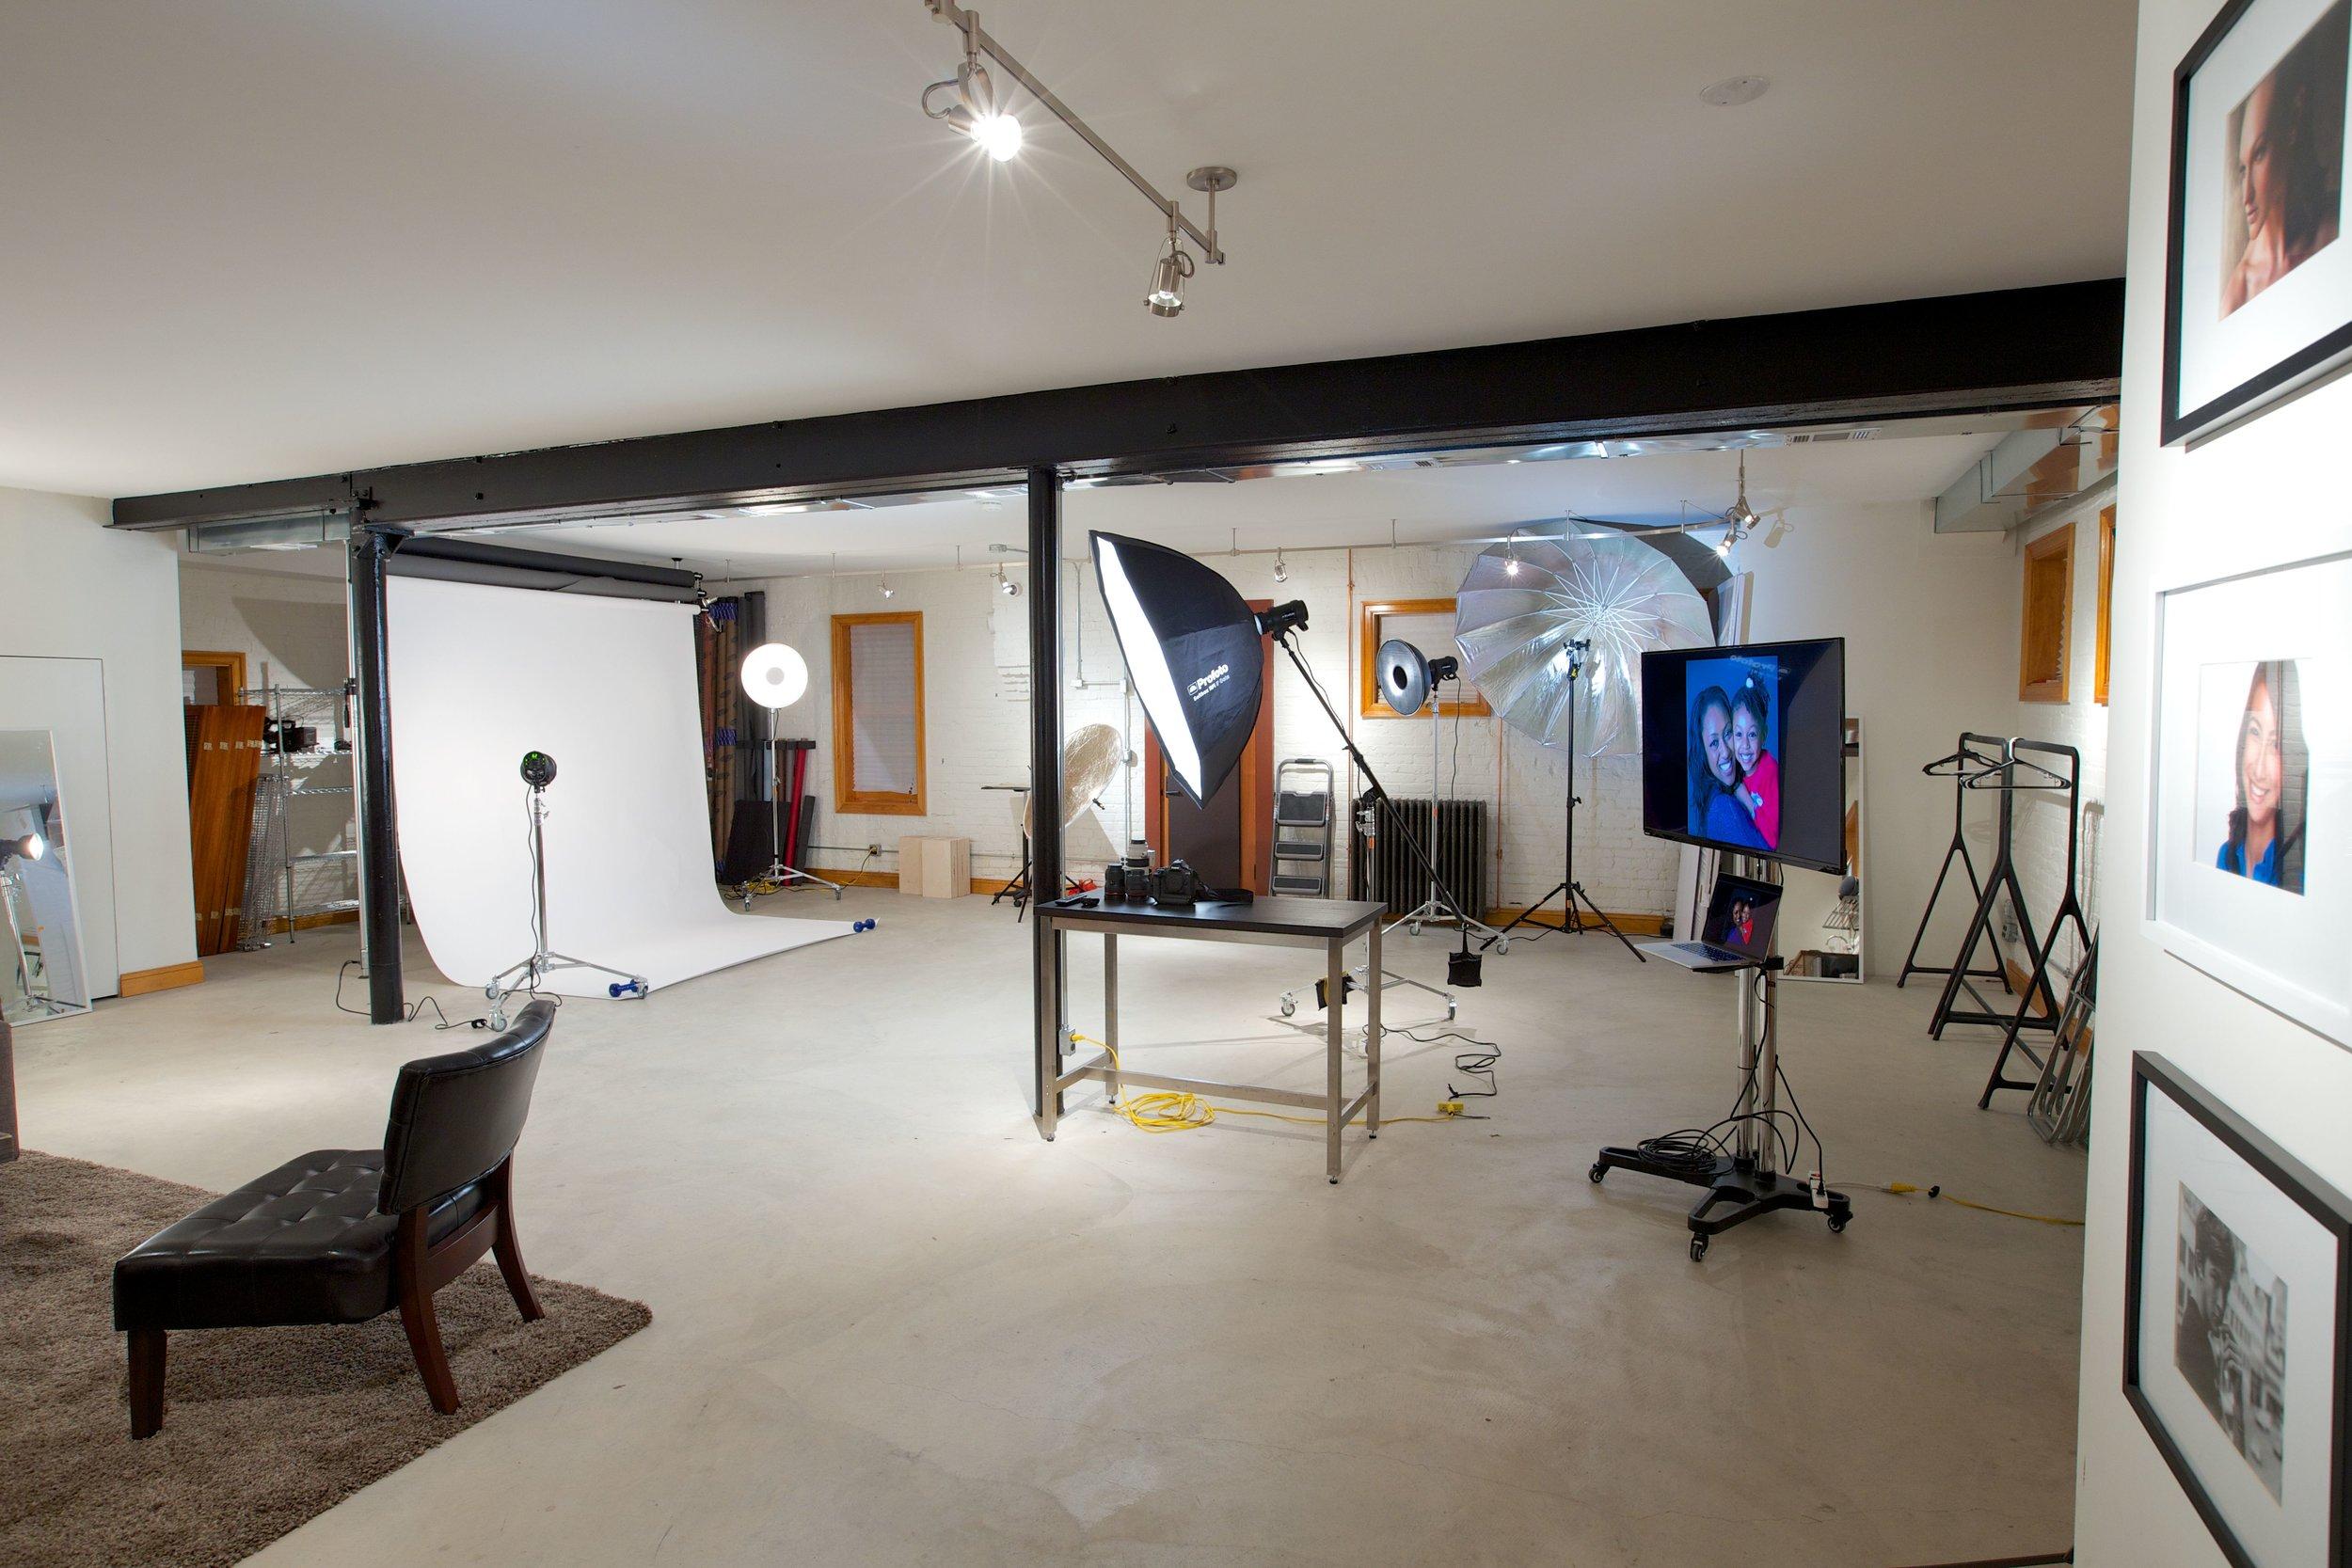 01202015 StudiowerksDC 3.jpg